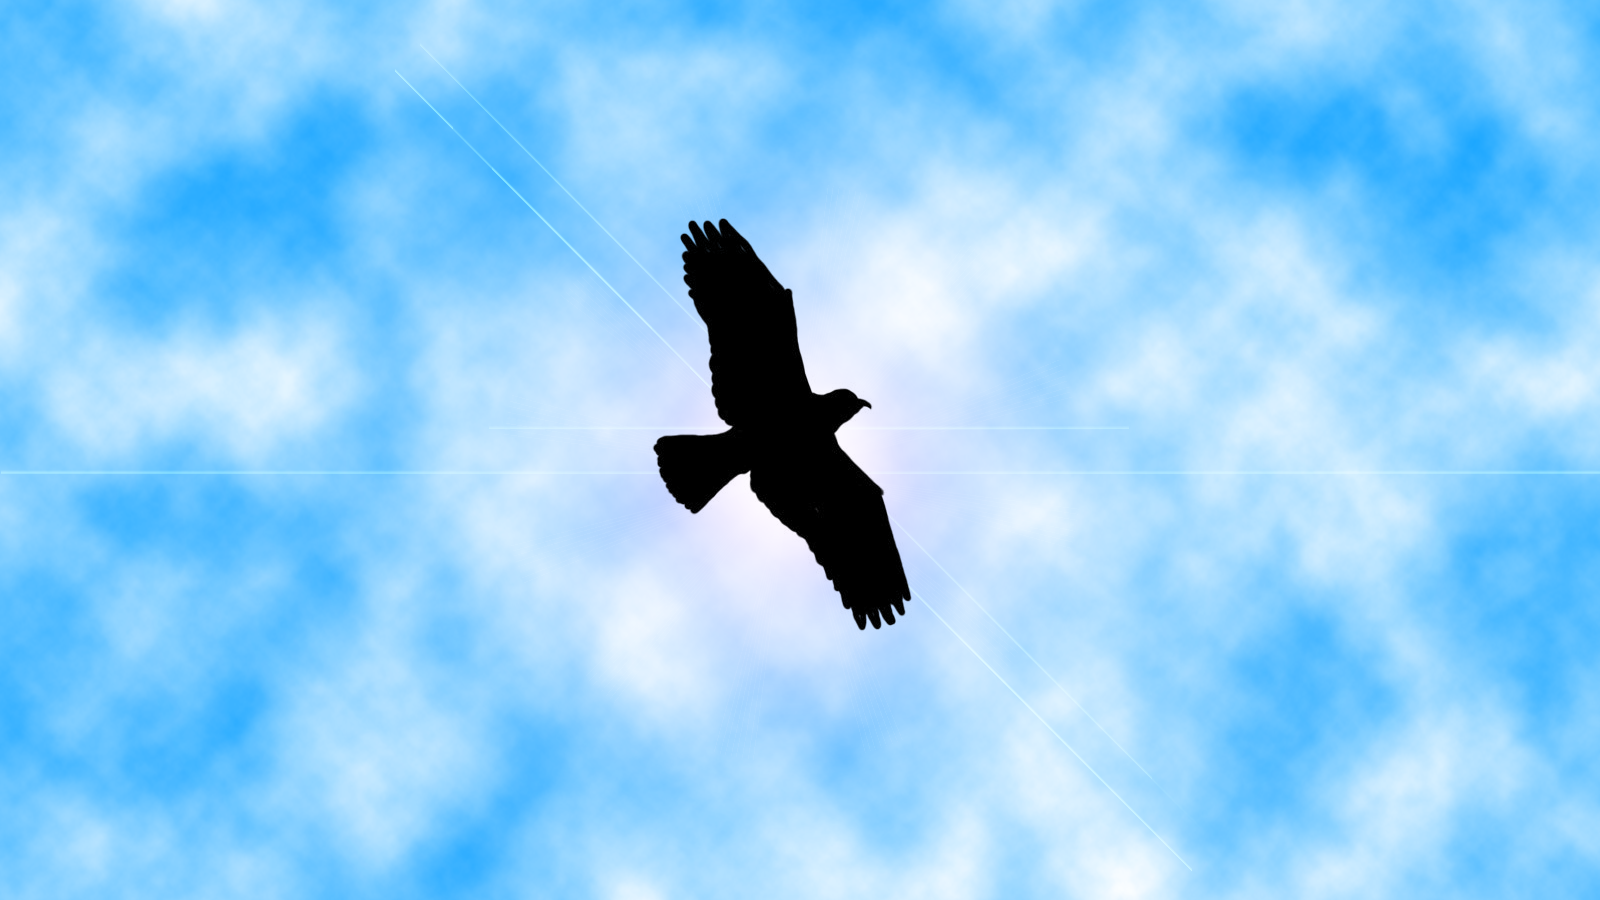 free bird by aoc 08 on deviantart